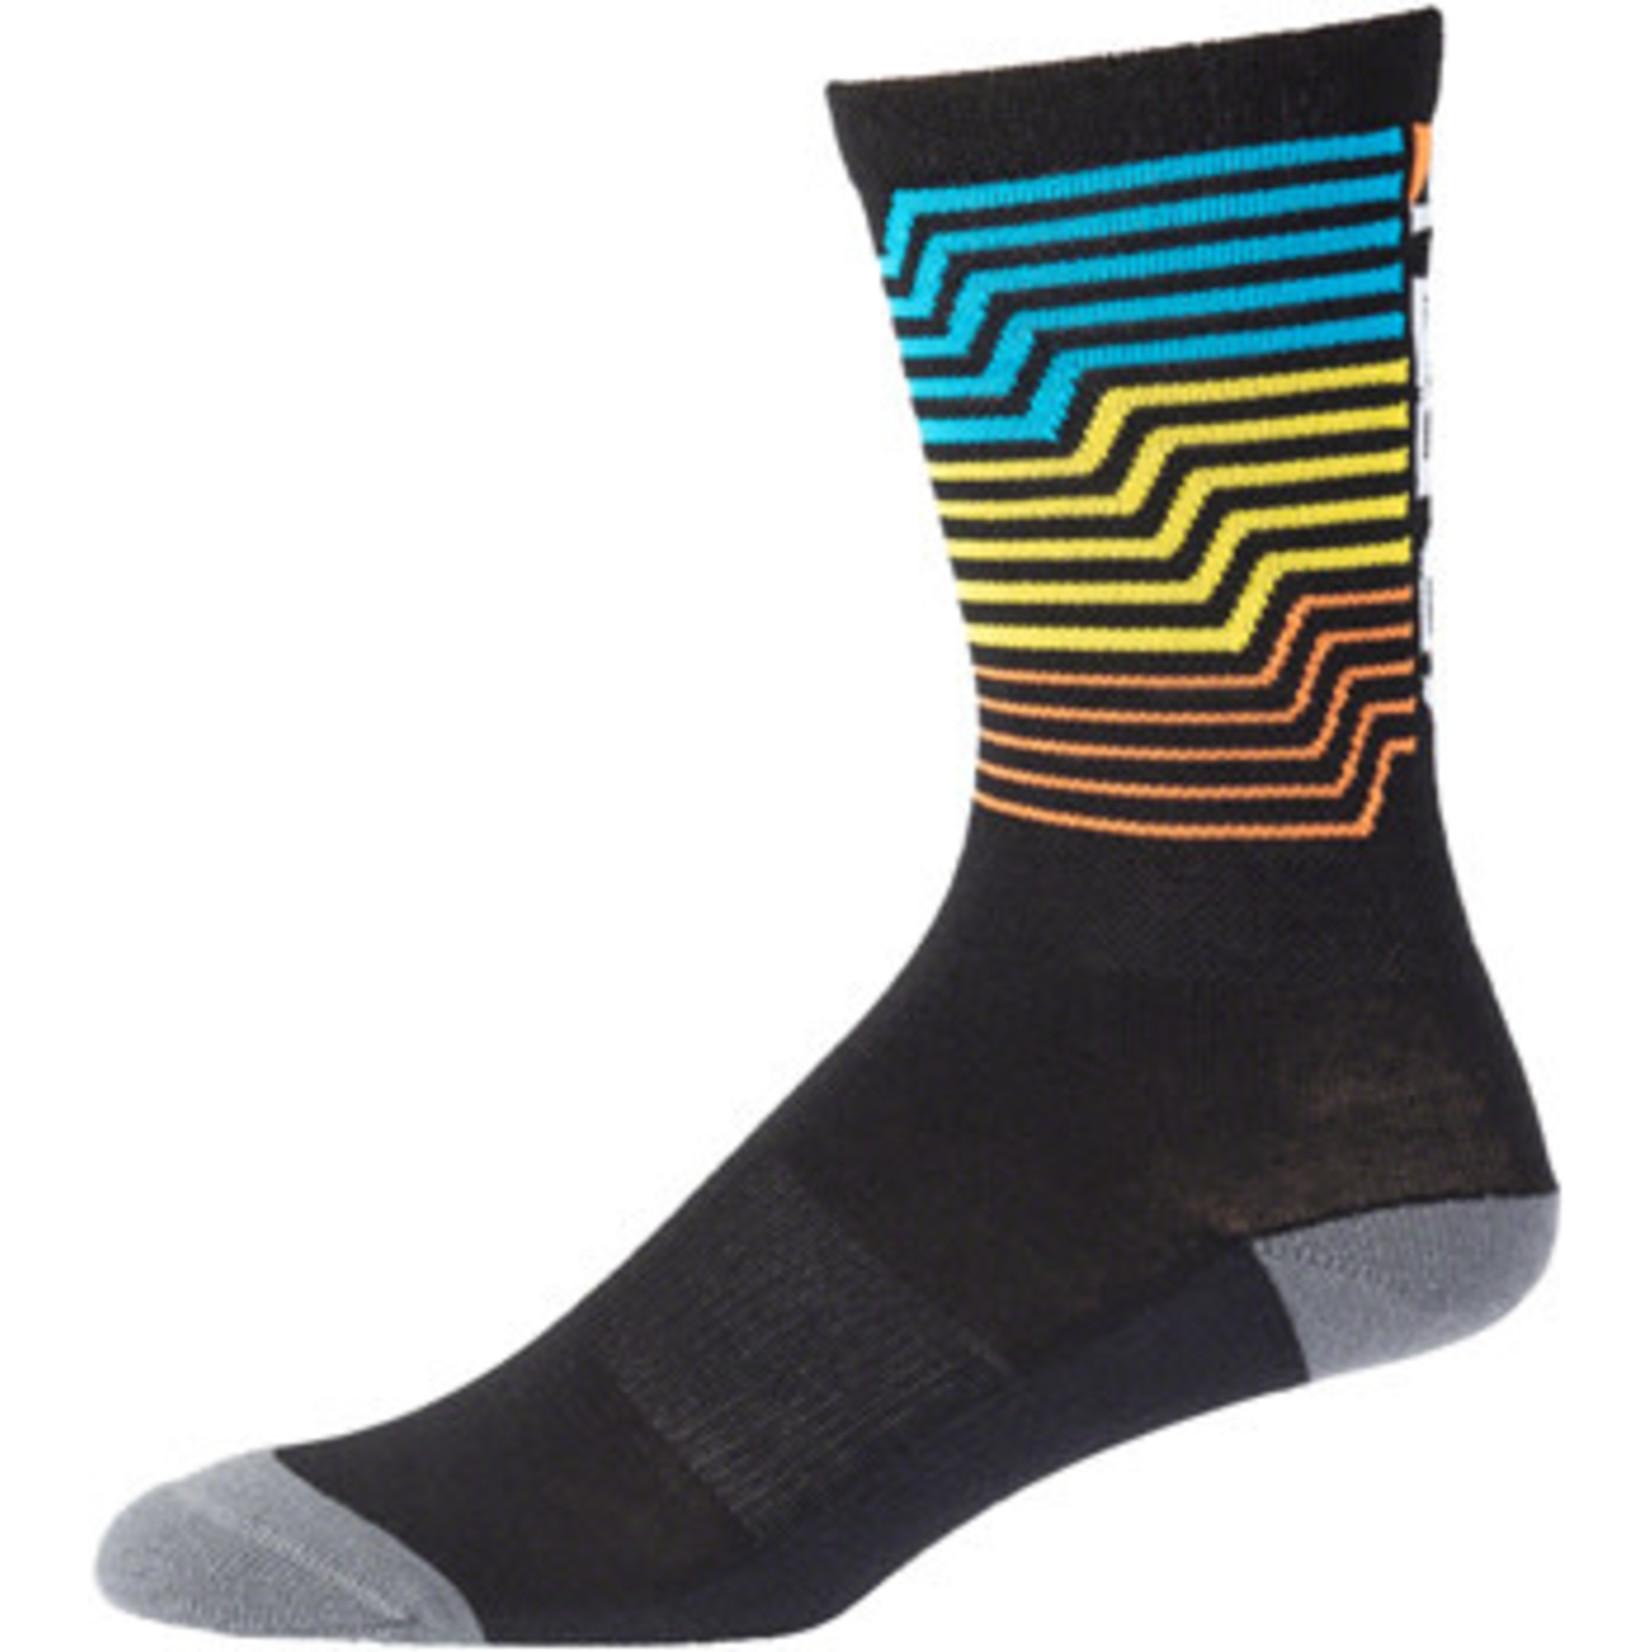 45NRTH 45NRTH Electric Rift Midweight Sock